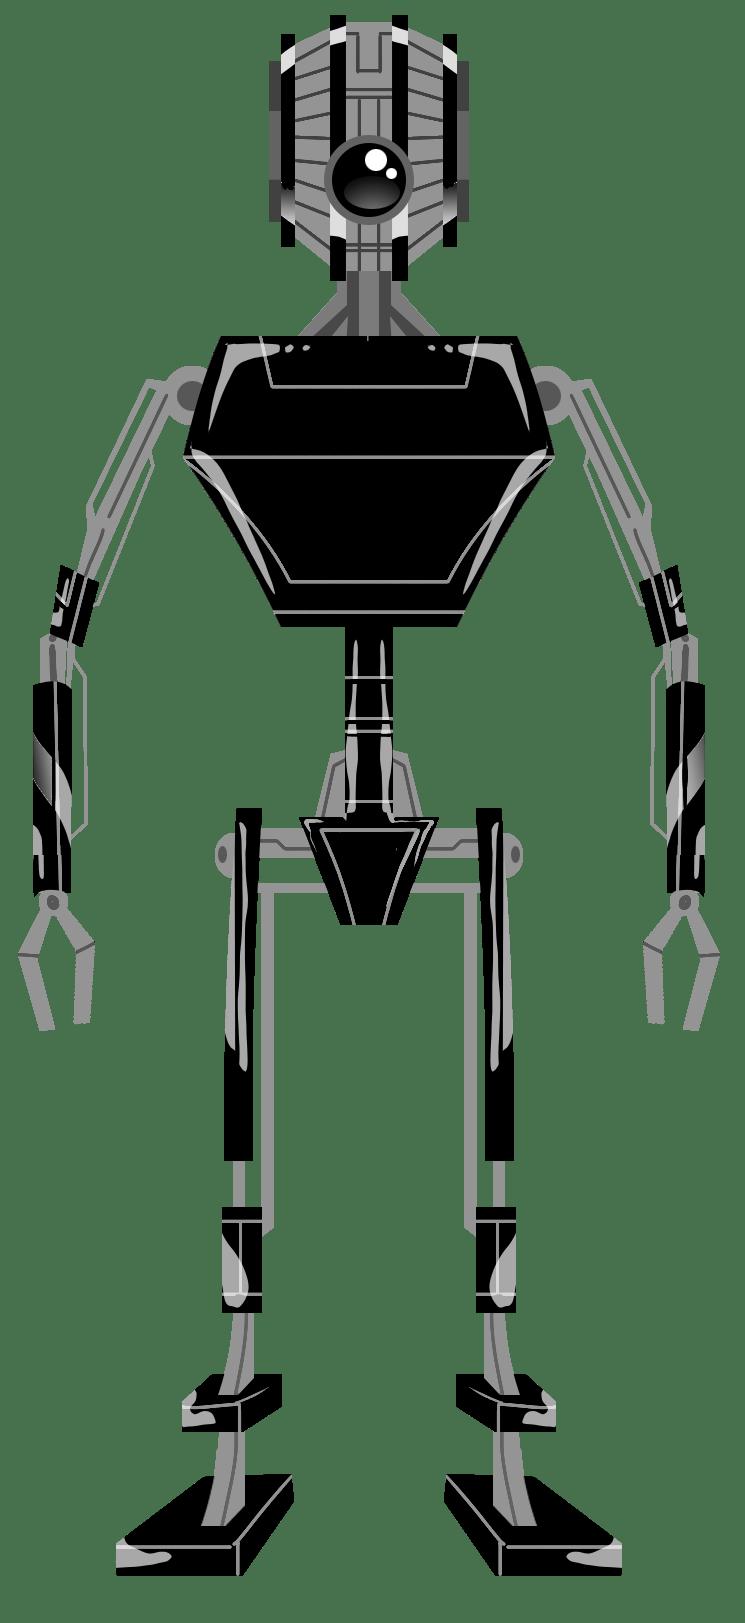 Droids A Visual Guide